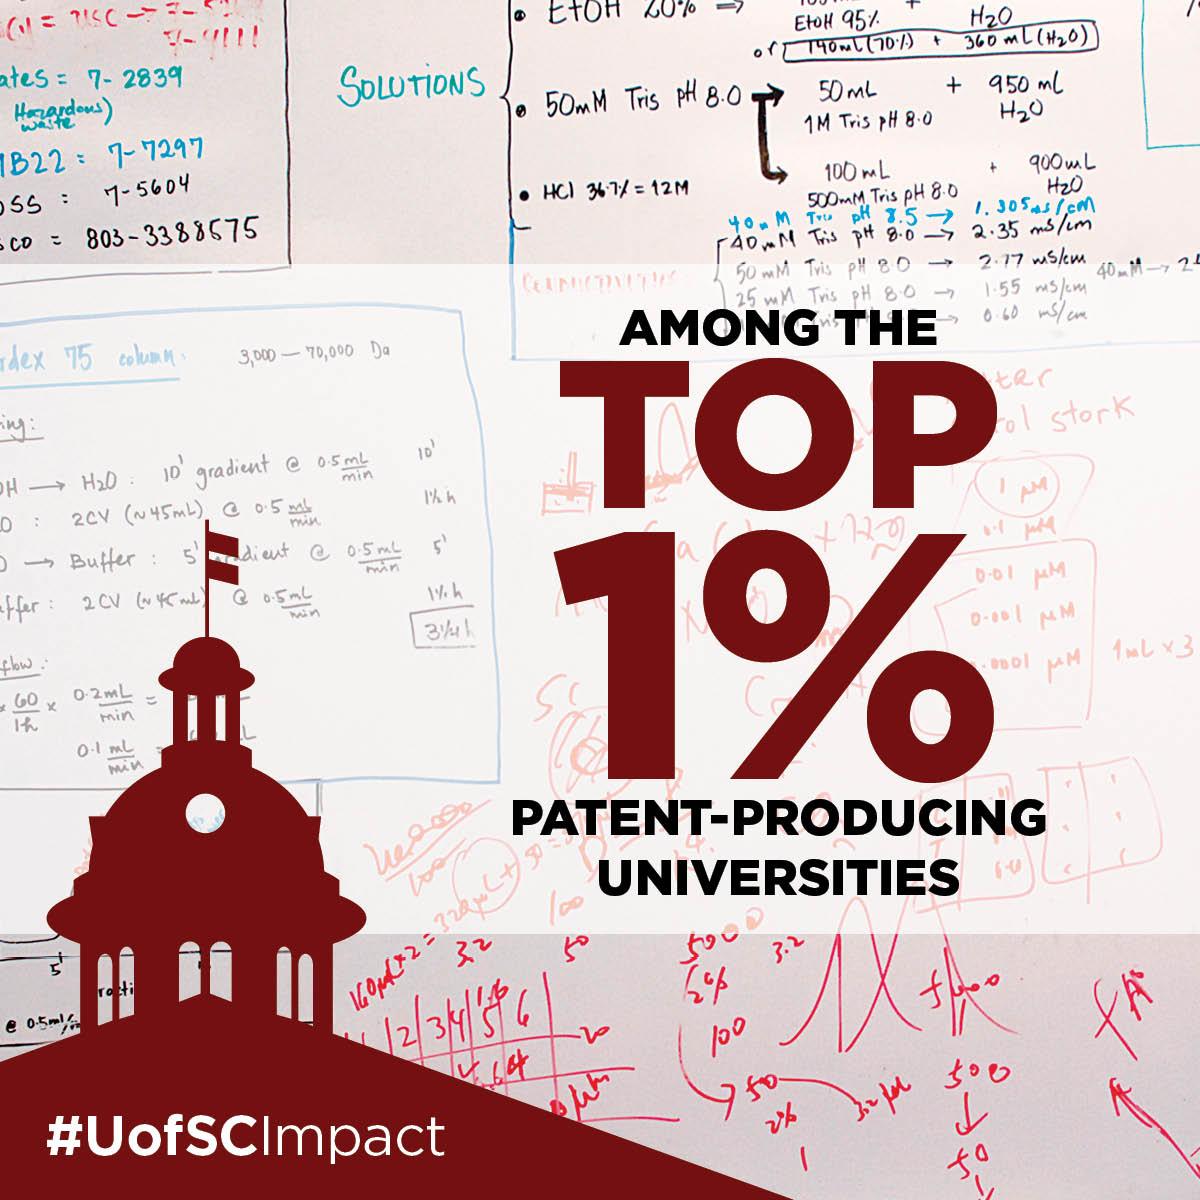 Among the top 1% patent-producing universities